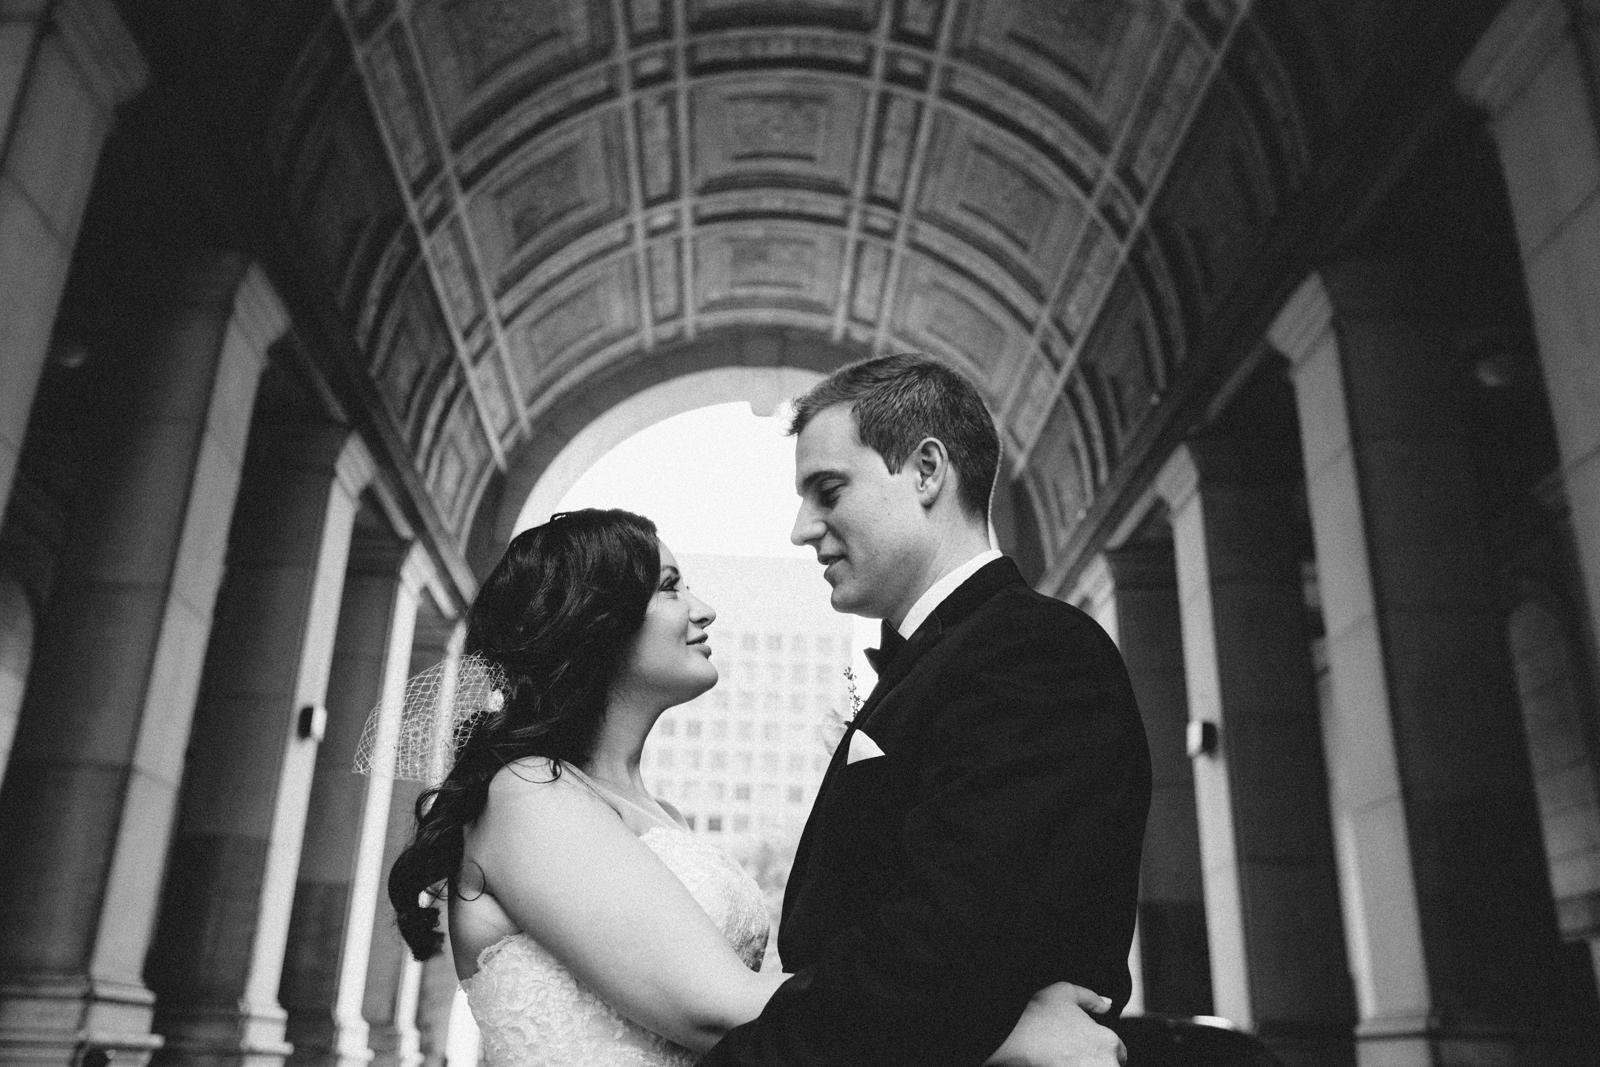 NYC Wedding Photography Lofts at Prince Brooklyn NYC Photographer Boris Zaretsky _B2C7925-Edit.jpg